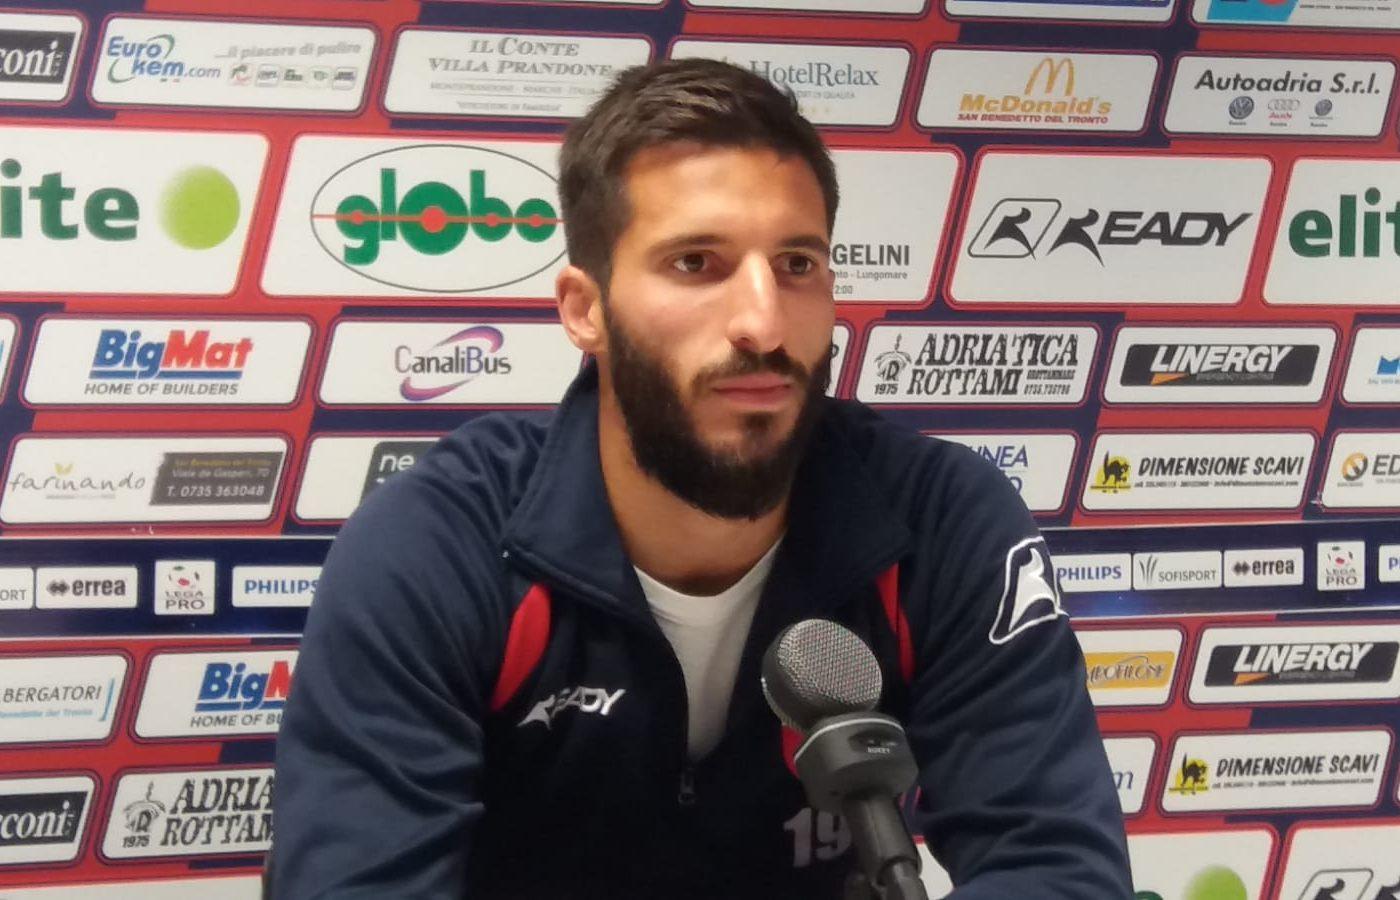 Matteo Fissore